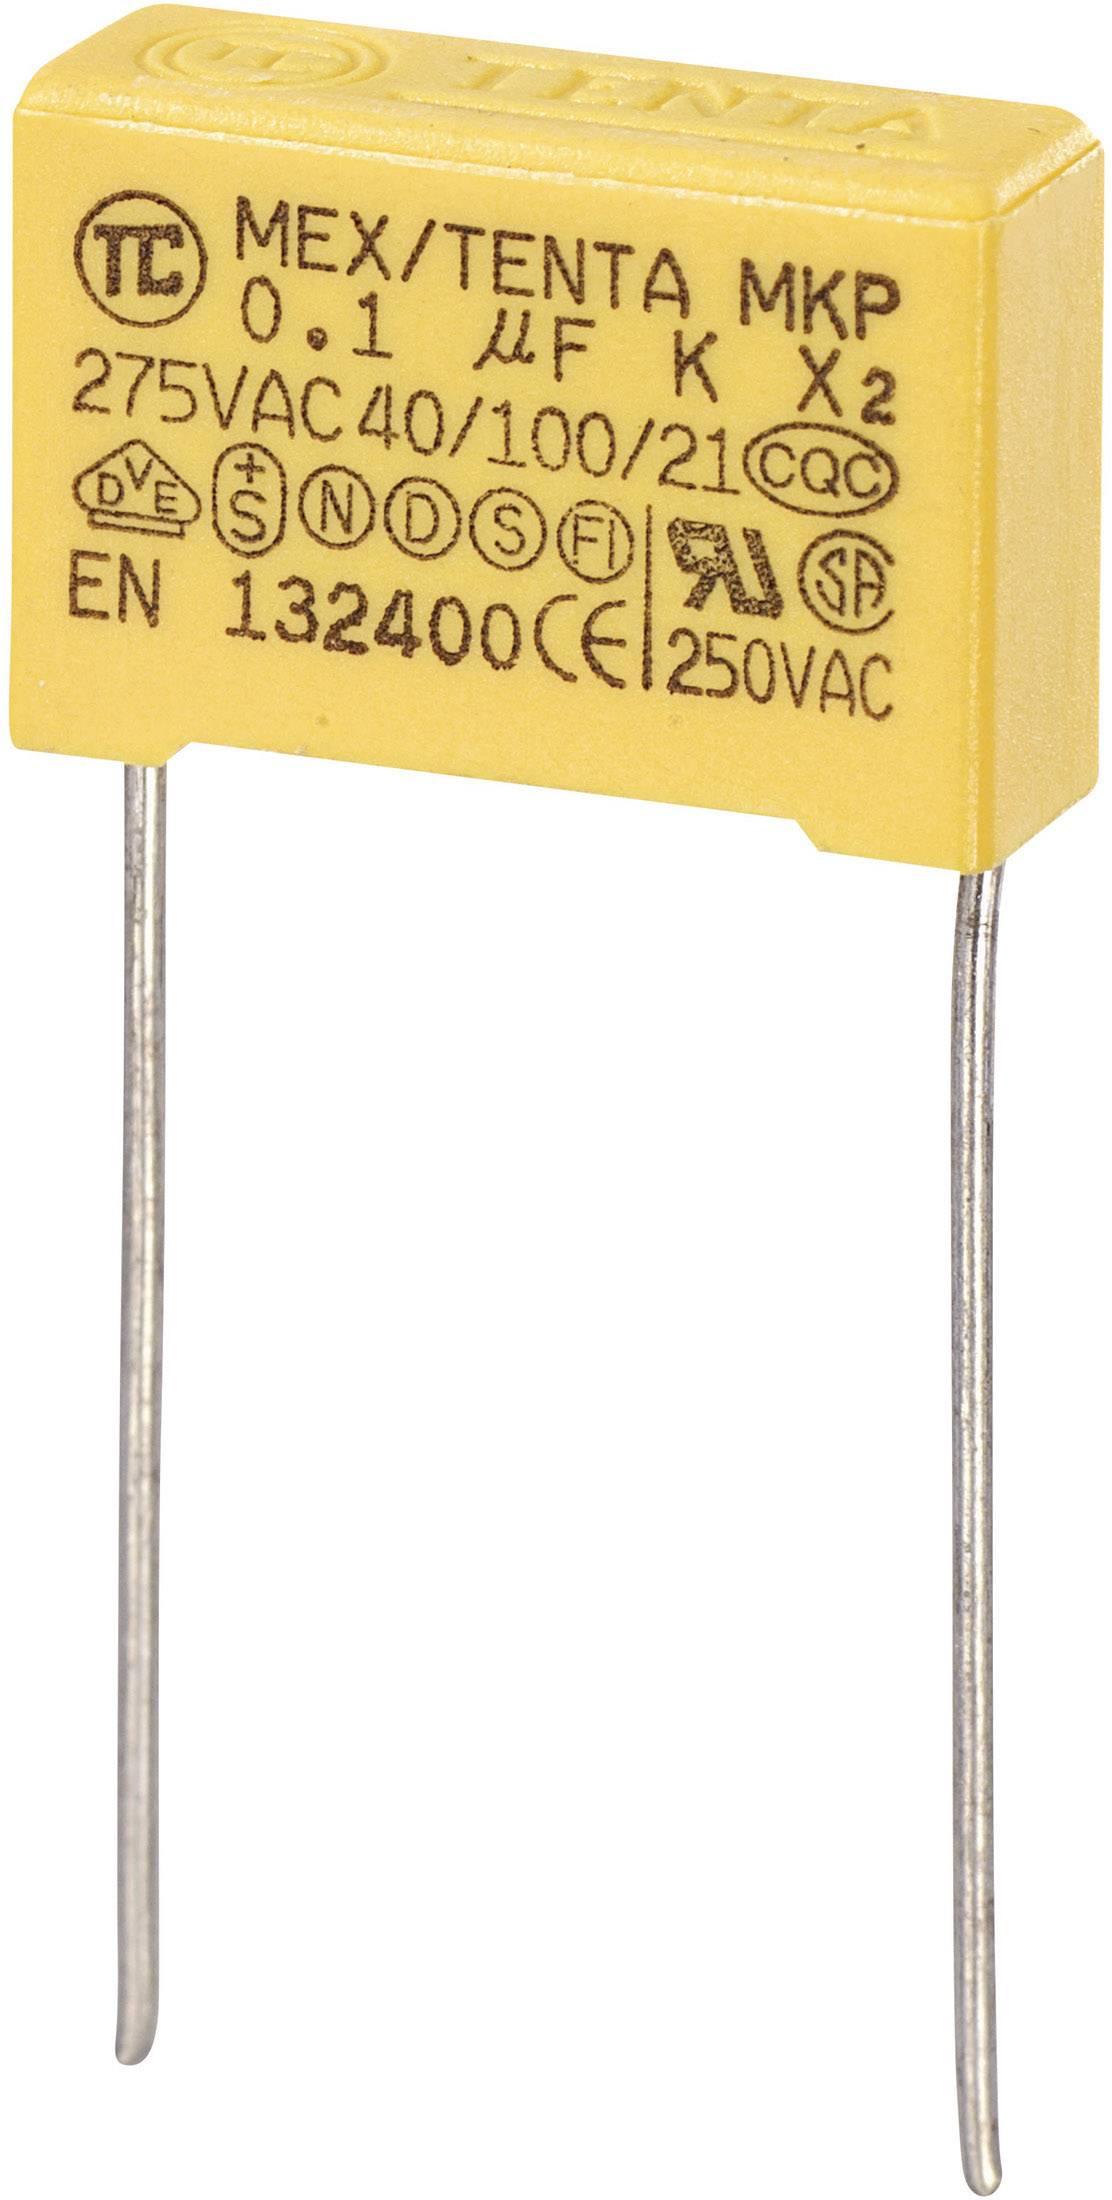 Foliový kondenzátor MKP, 0,15 µF, X2 275 V/AC, 10 %, 18 x 8,5 x 14,5 mm